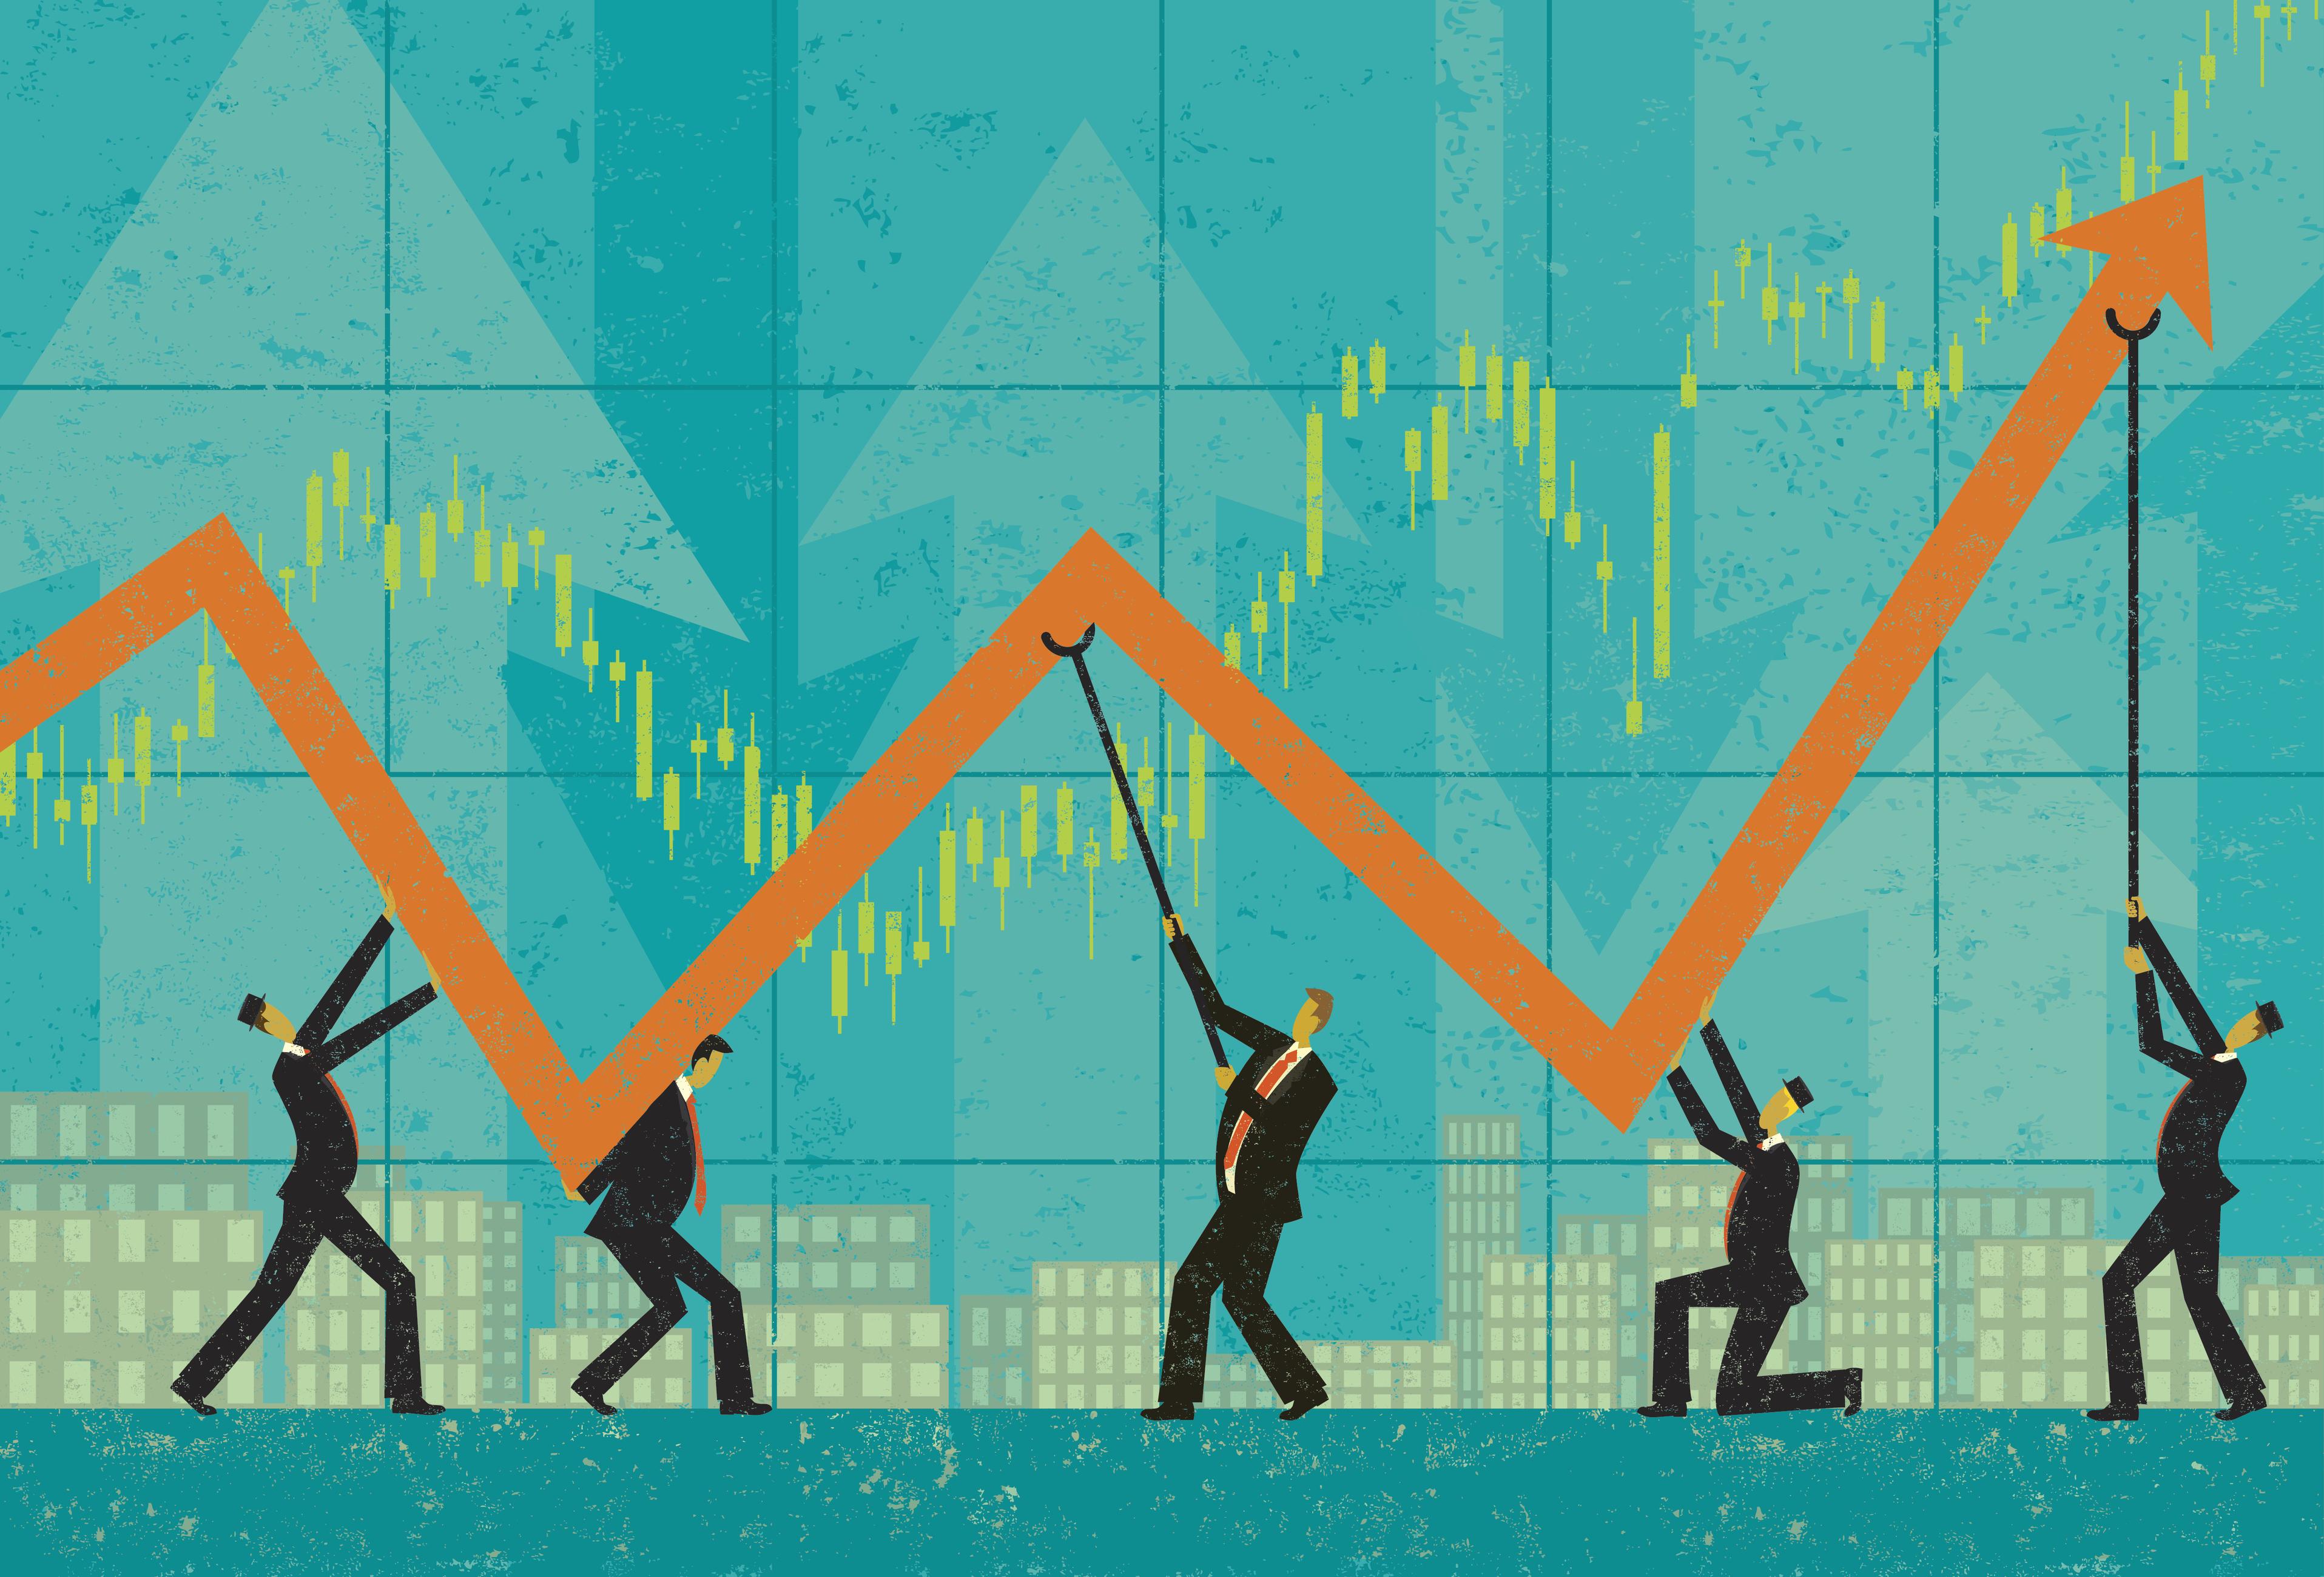 Картинка про экономику